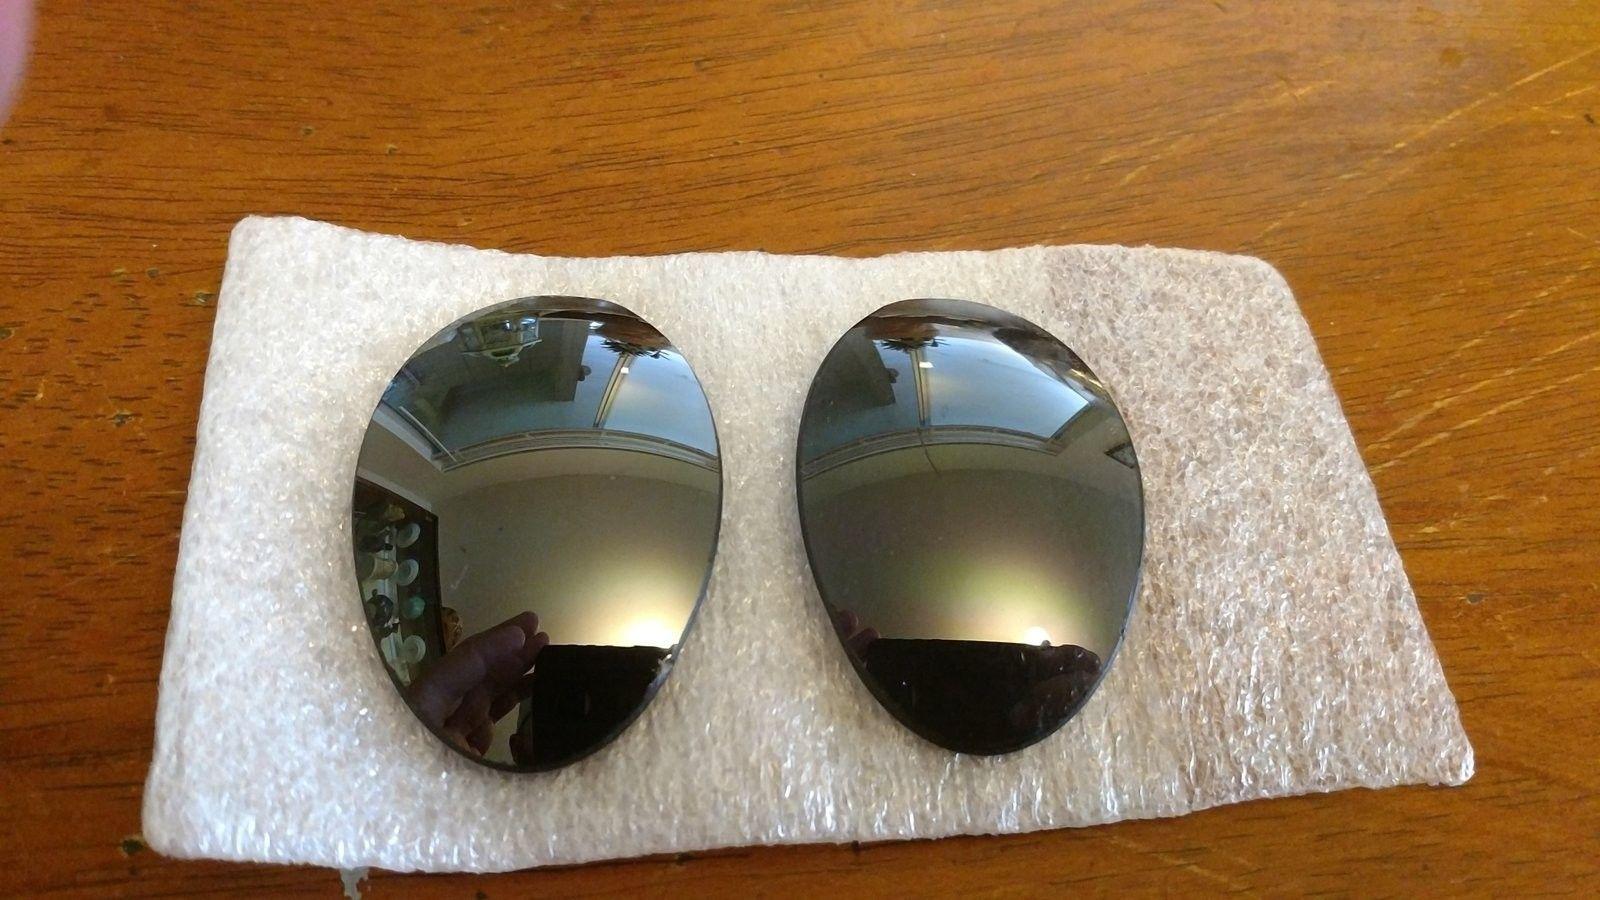 Romeo OEM Etched BI Lenses - 3 Pairs-  decided to keep - IMG_20160921_102204689.jpg